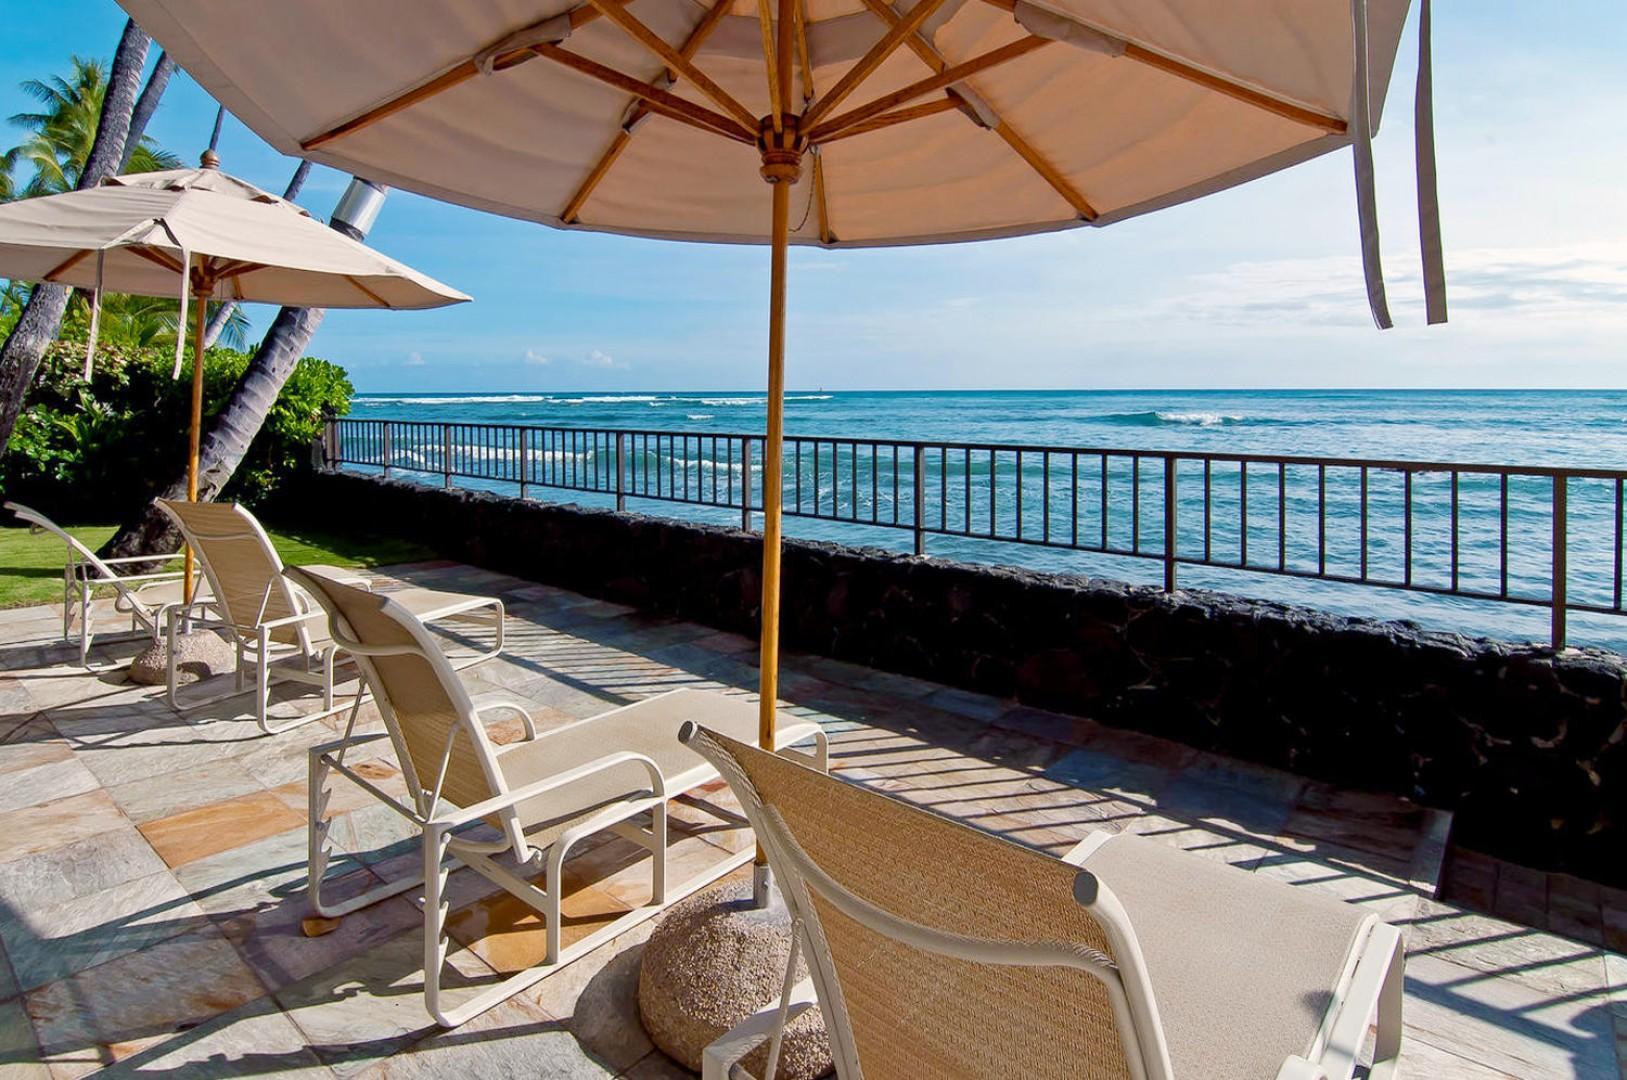 Enjoy sunbathing on the oceanfront deck.